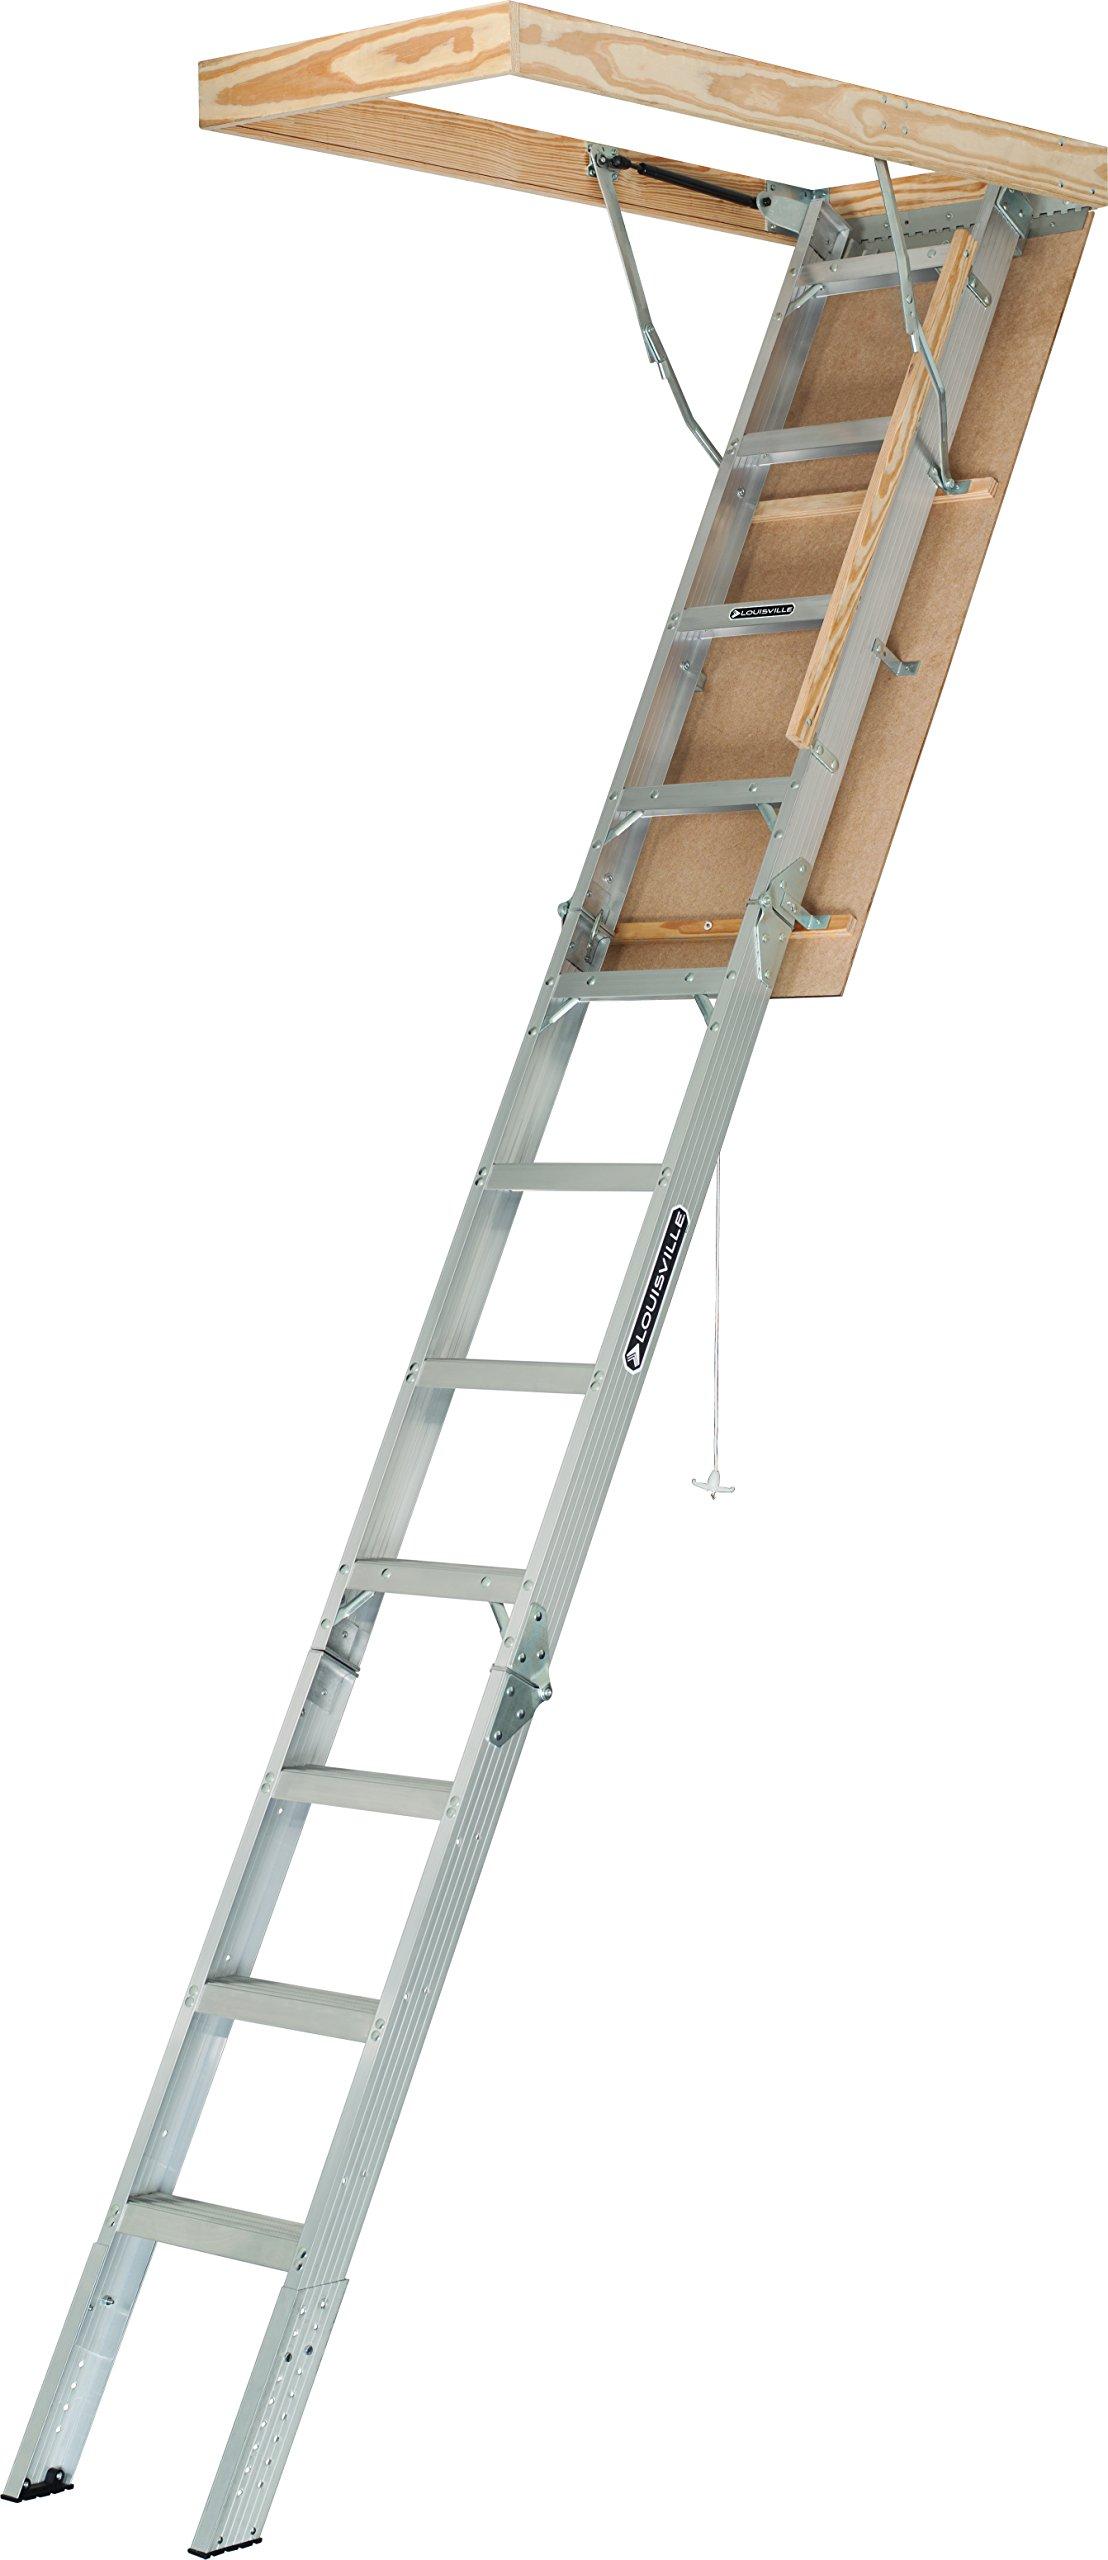 Louisville Ladder AA2210 Elite Aluminum Attic Ladder Type IAA, 22-1/2-Inch x 54-Inch, 375 Pound Load Capacity